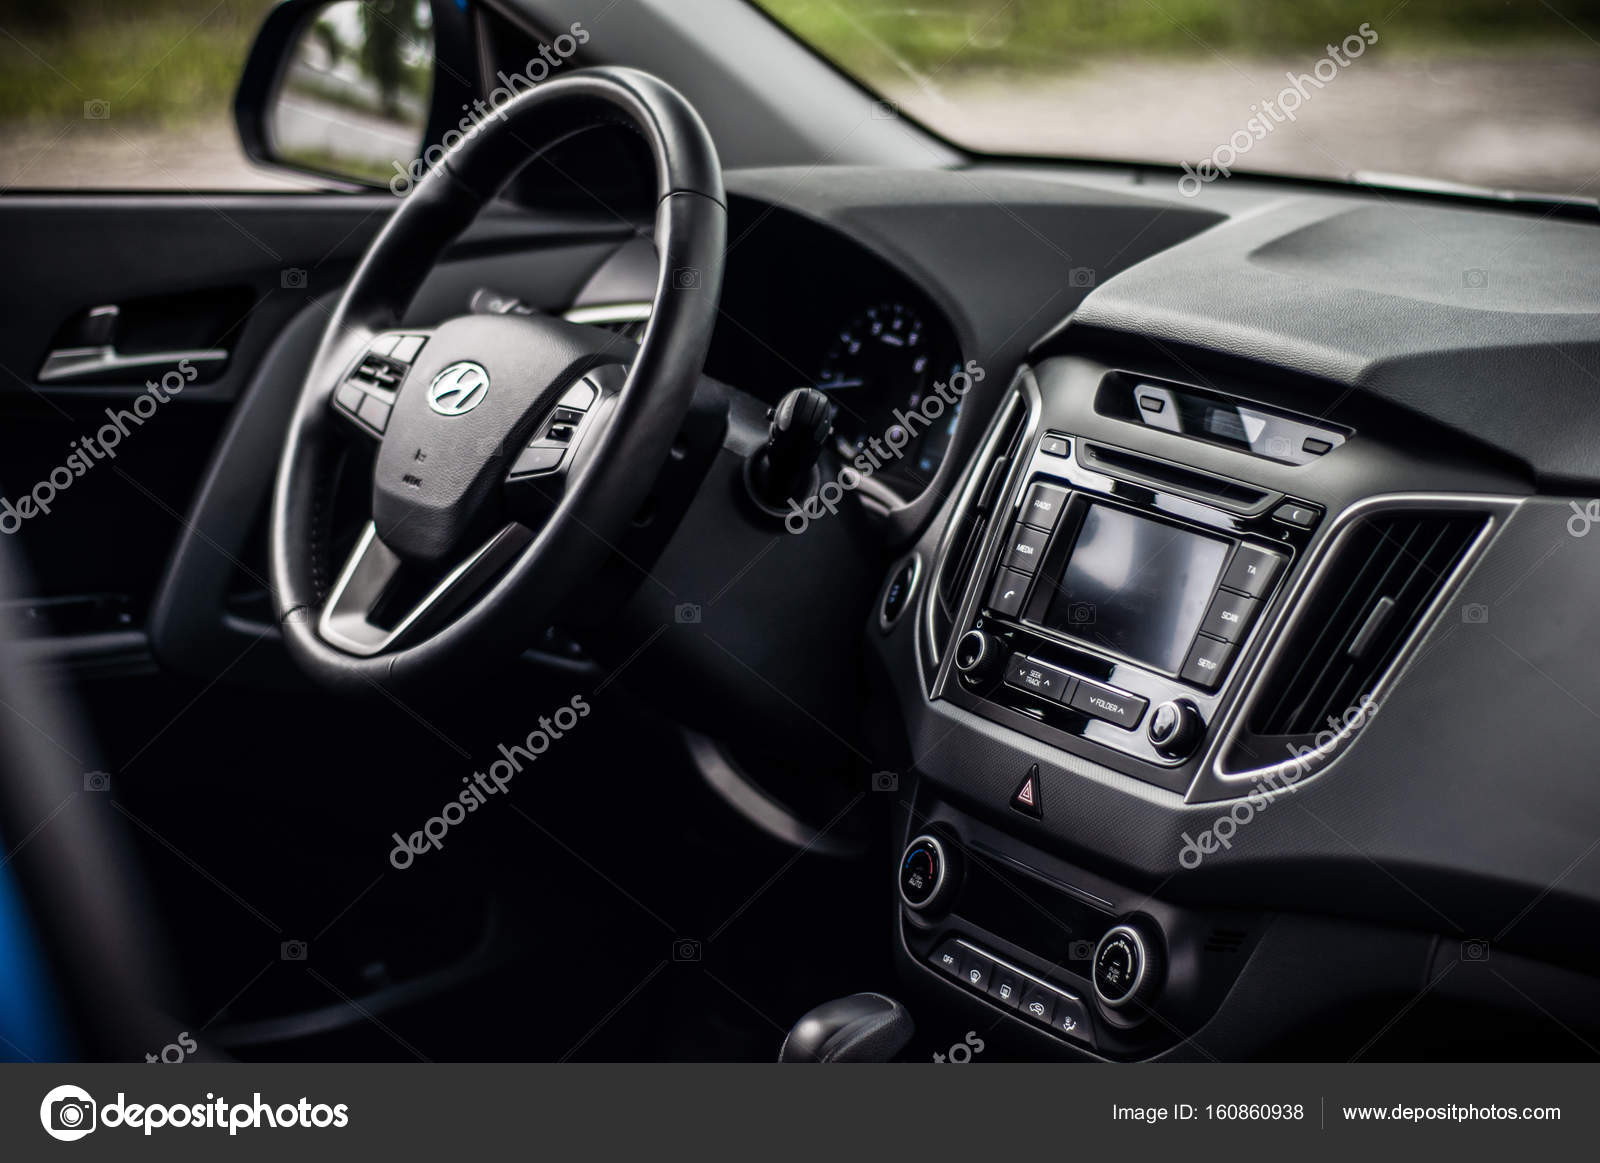 india forum indian testing huyndai suv hyundai compact named in edit scene rear creta caught car the